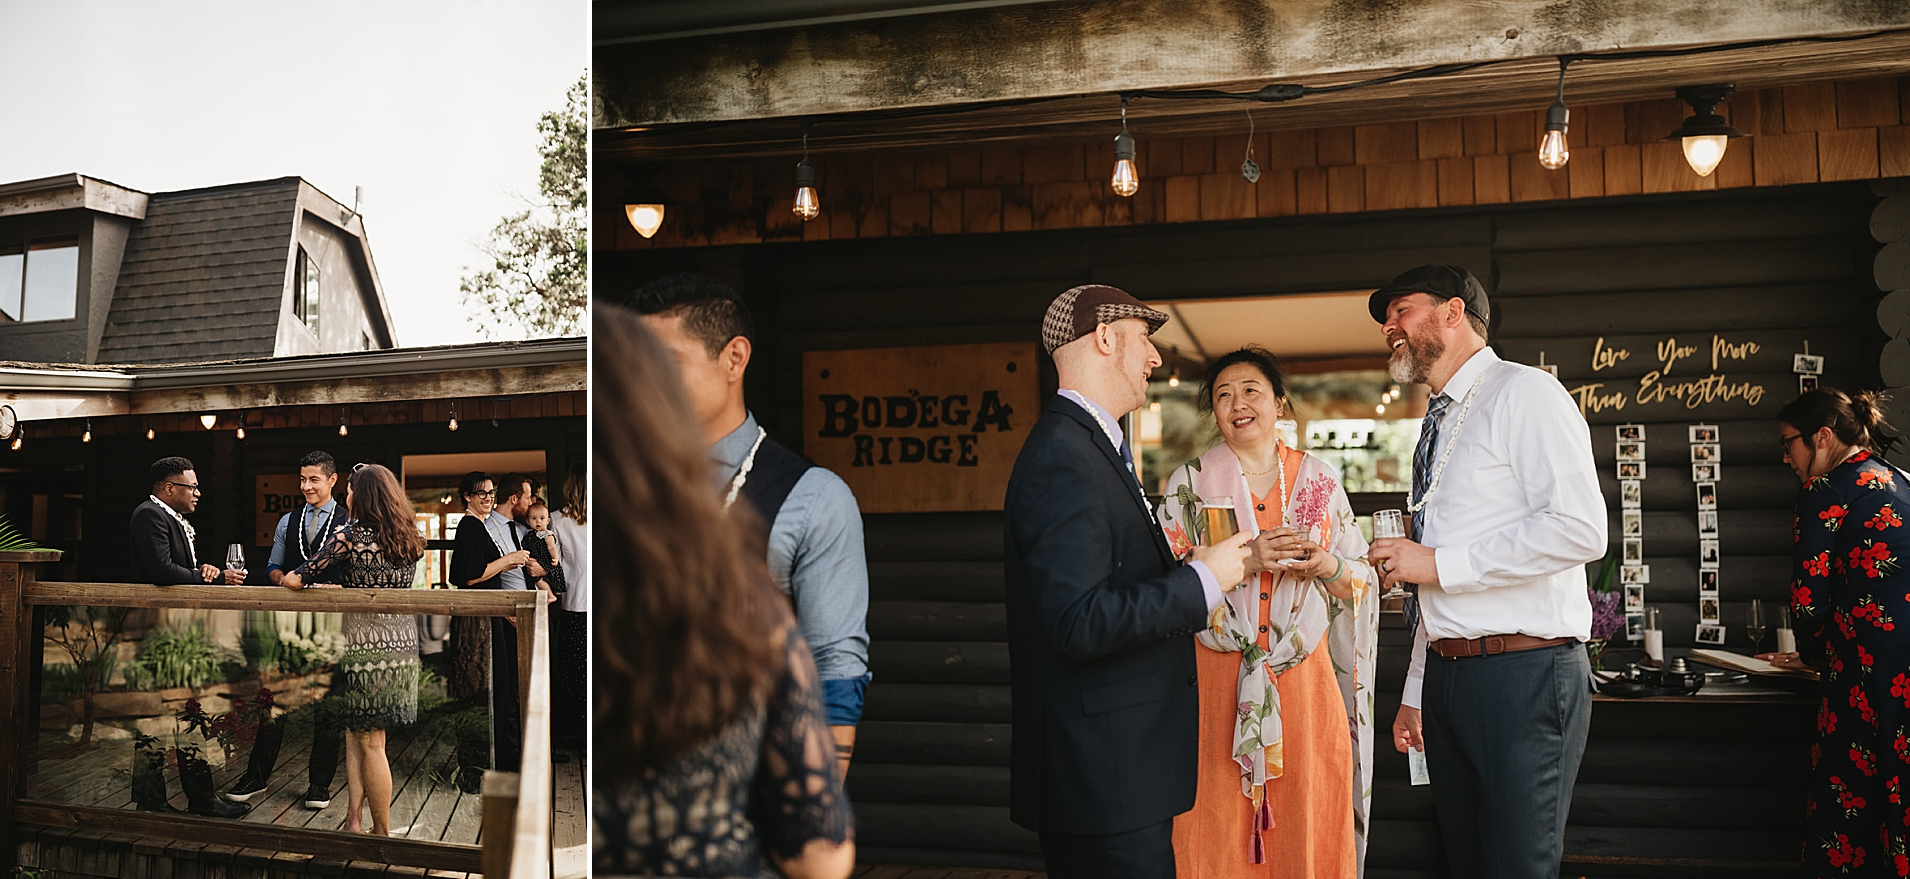 bodega ridge wedding cocktail hour.jpg